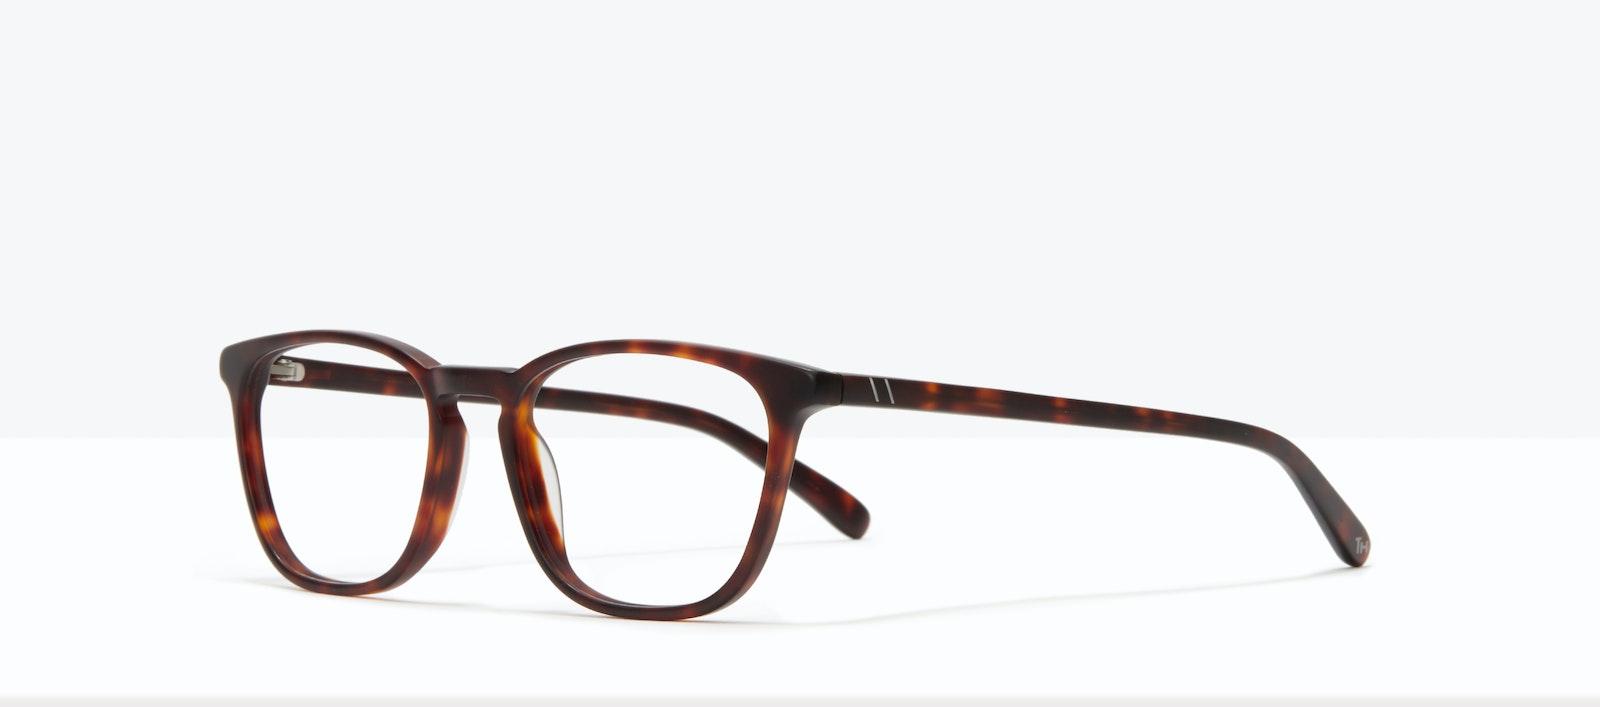 Affordable Fashion Glasses Square Eyeglasses Men Louise M Matte Tort Tilt